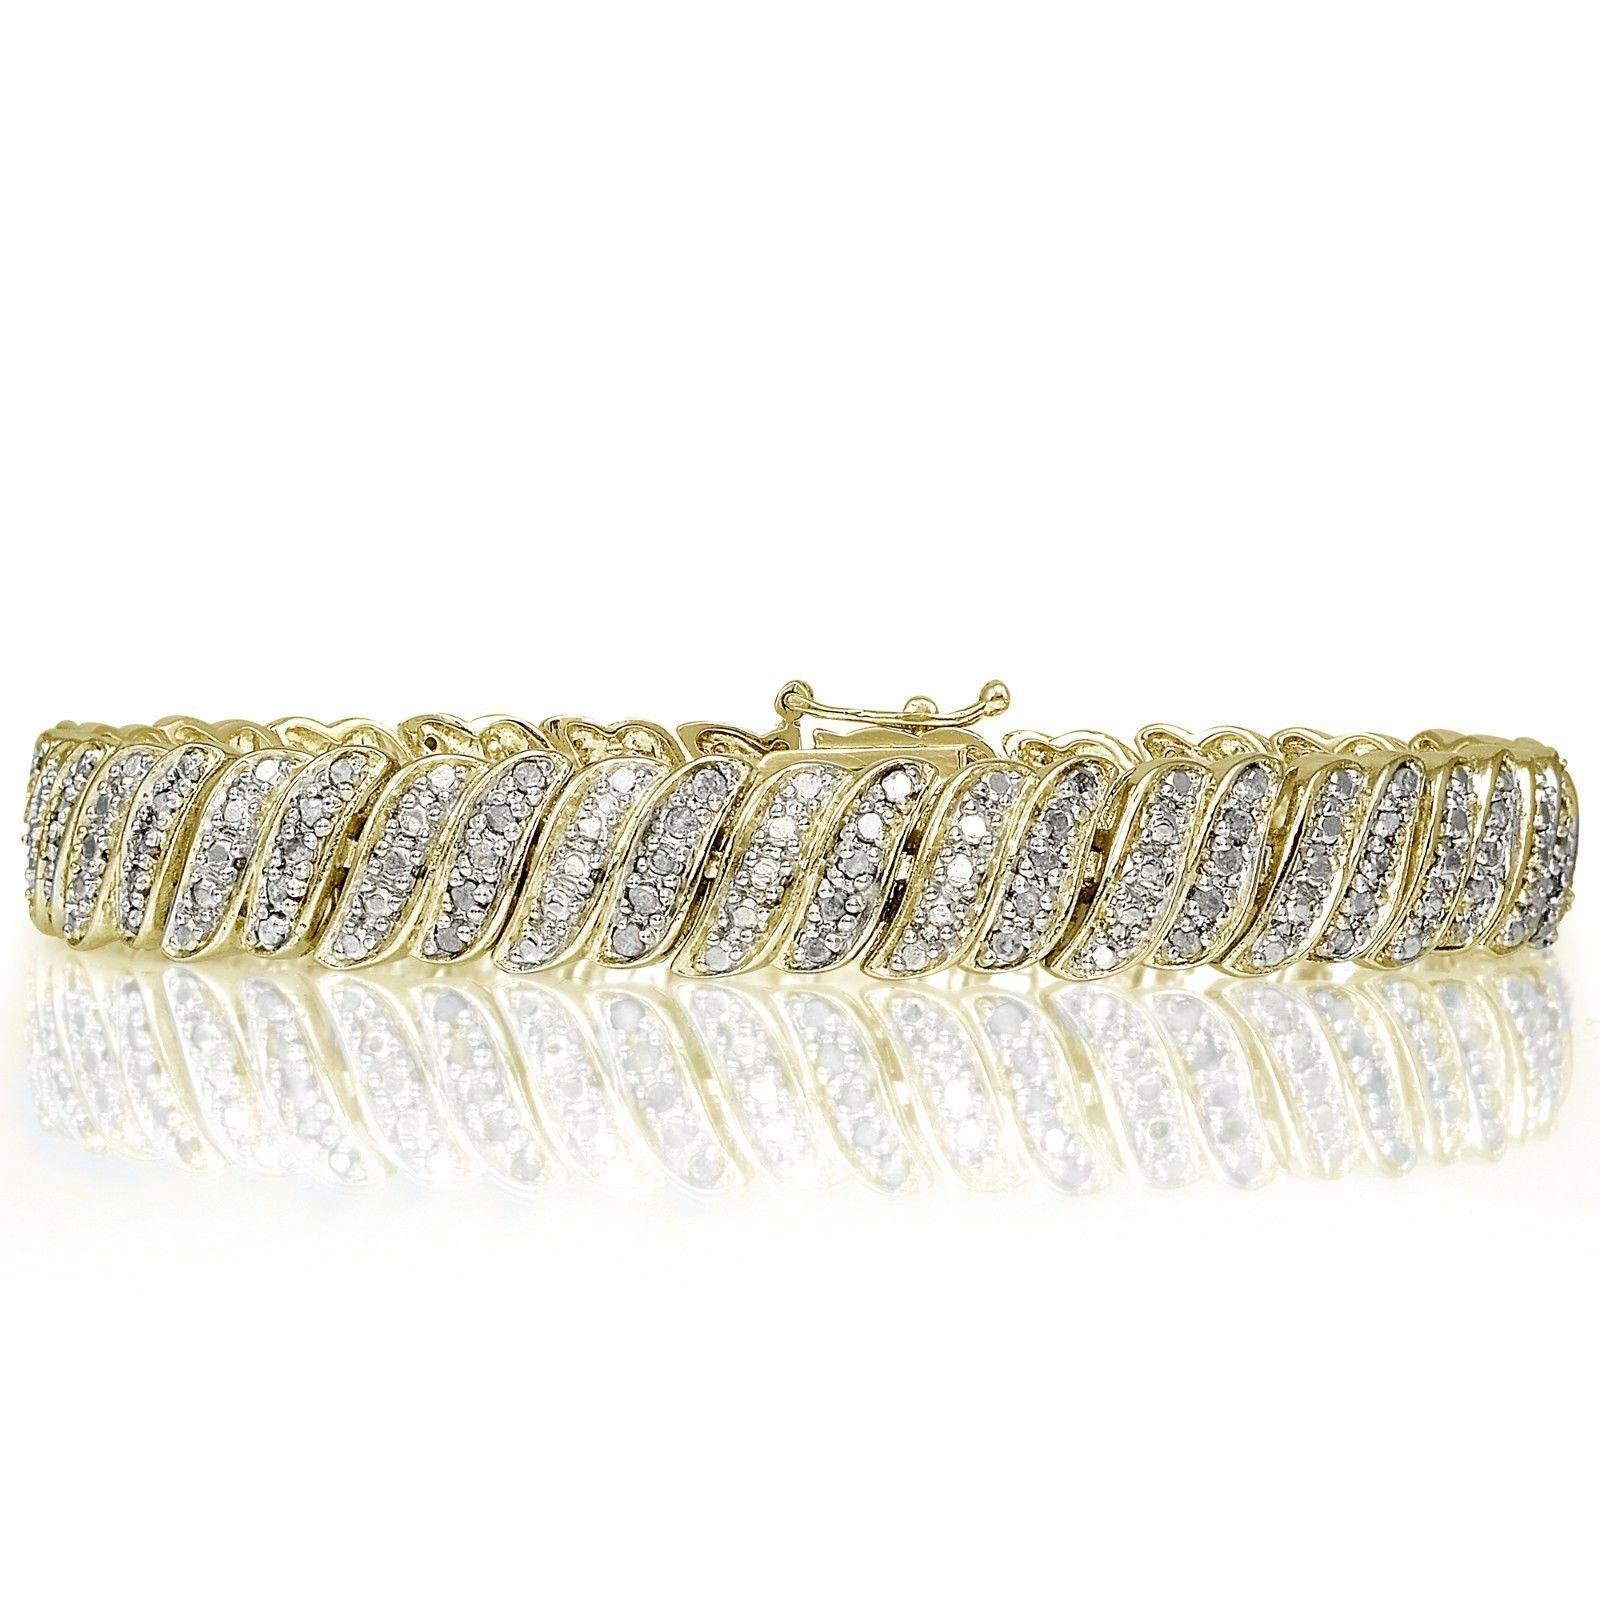 18K Yellow Gold Finish S-Link 1.0CTW Diamond Tennis Bracelet for Women - 8 Inches